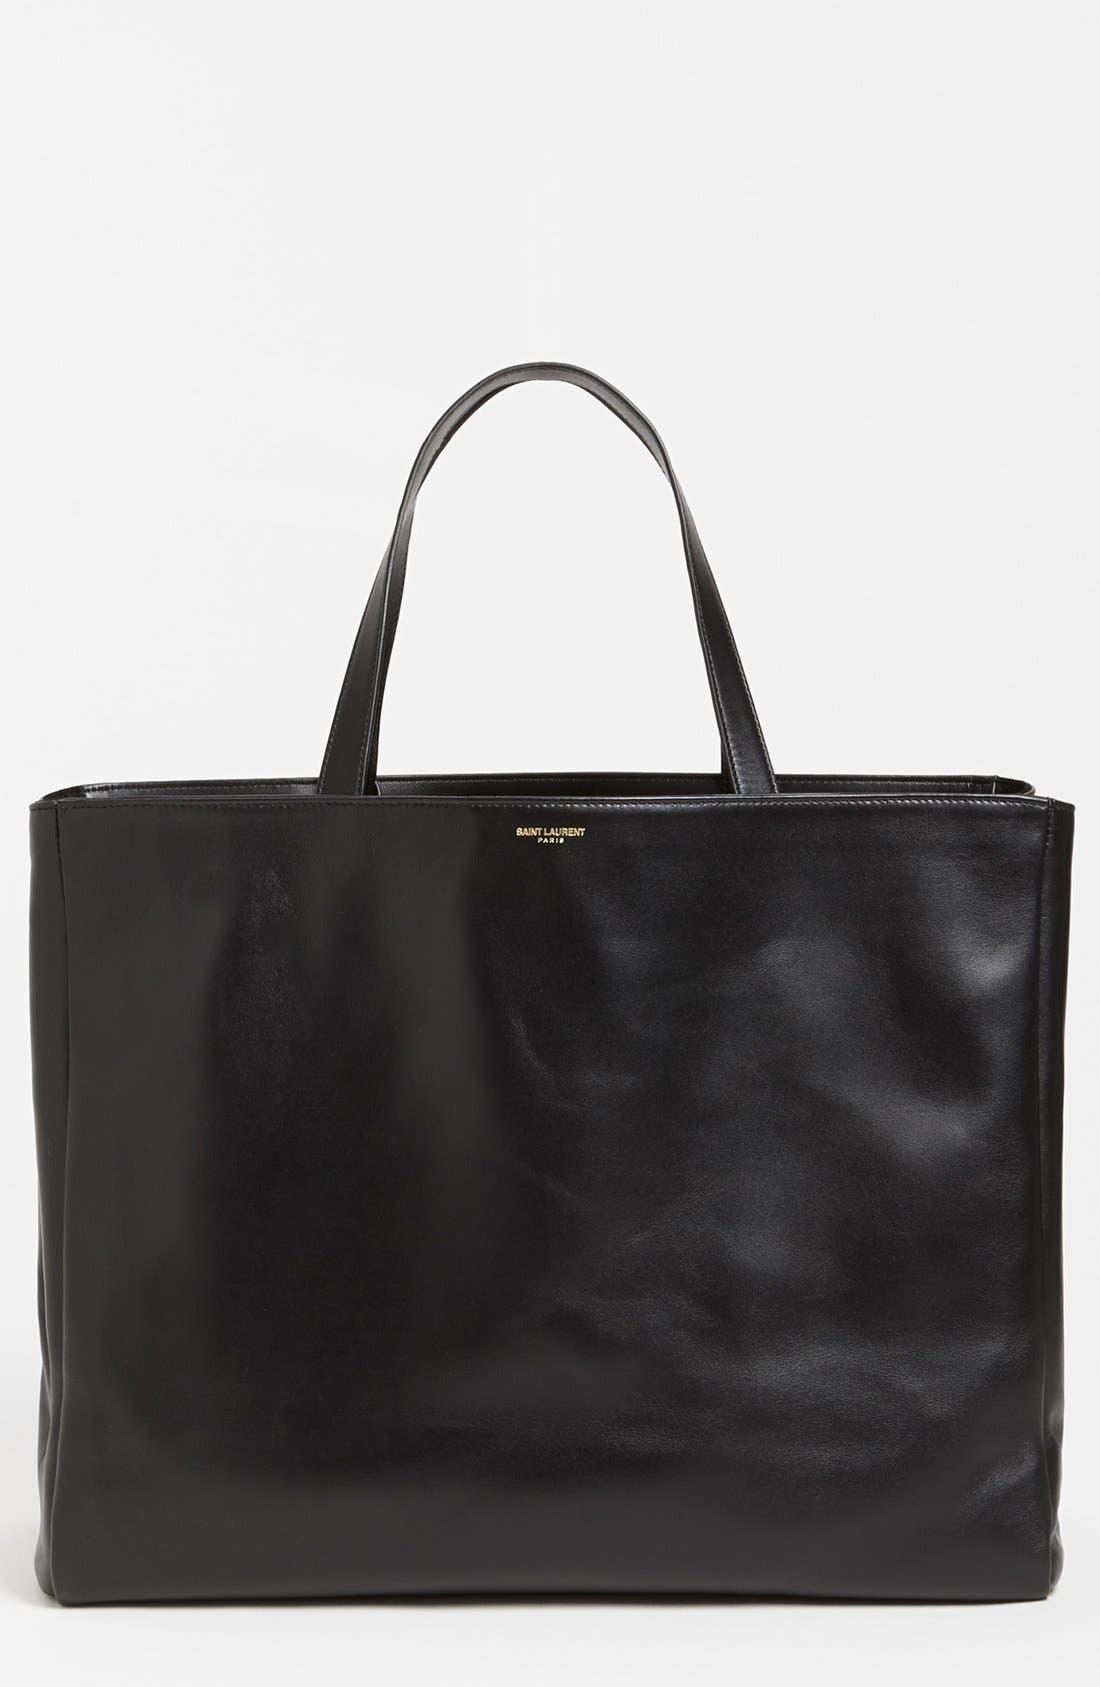 Main Image - Saint Laurent Leather Tote, Large